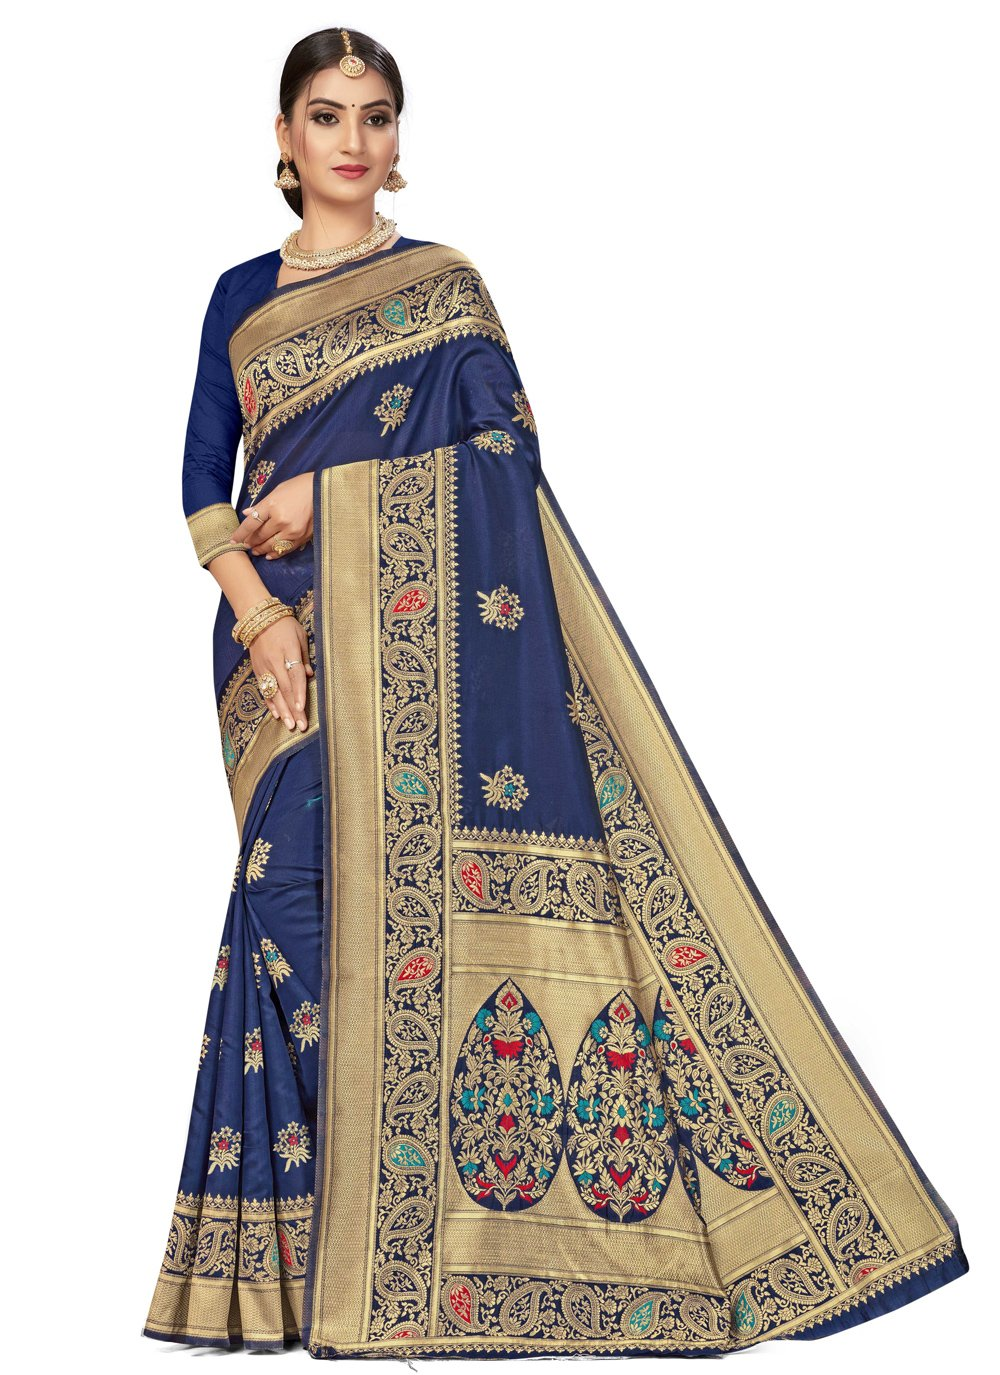 Banarasi Silk Traditional Saree in Blue